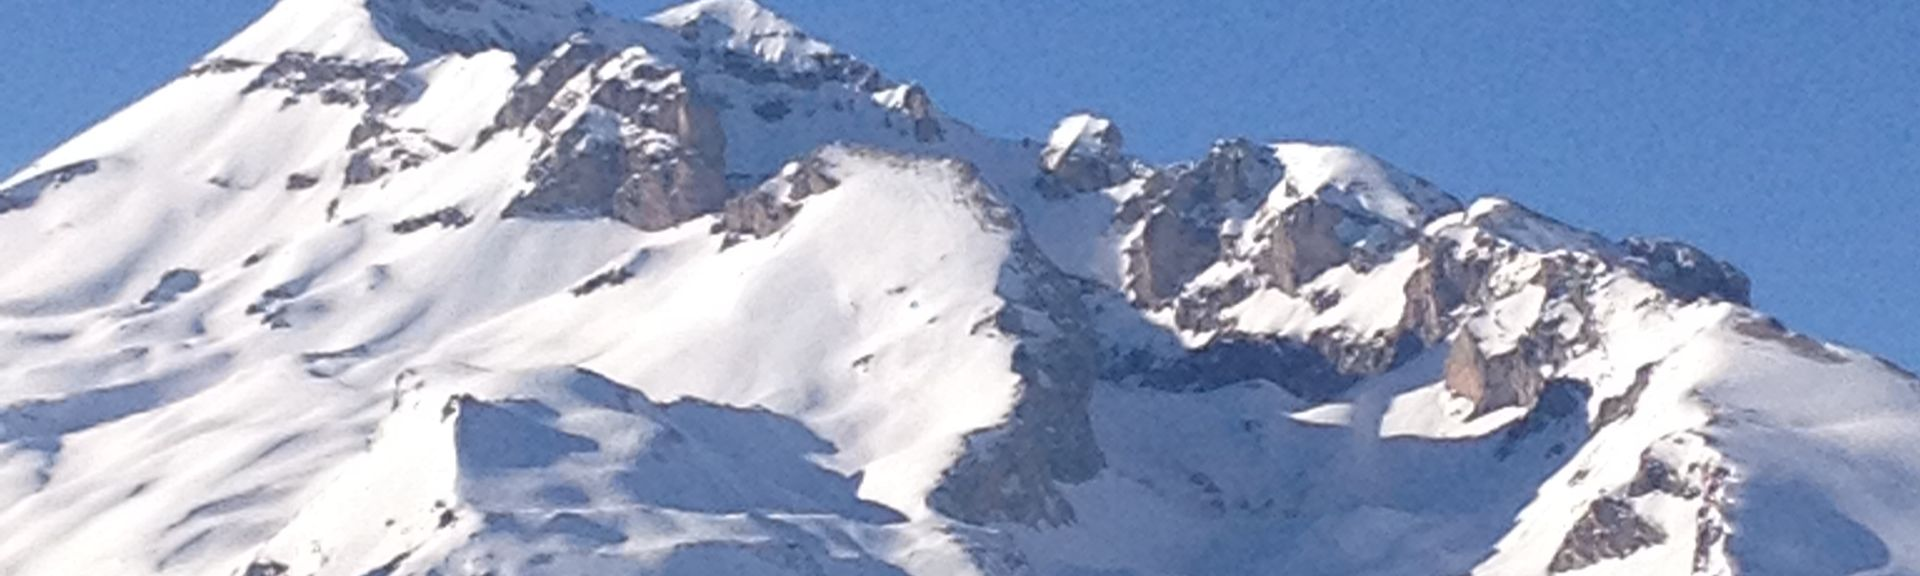 Saint-Firmin, Hautes-Alpes, France